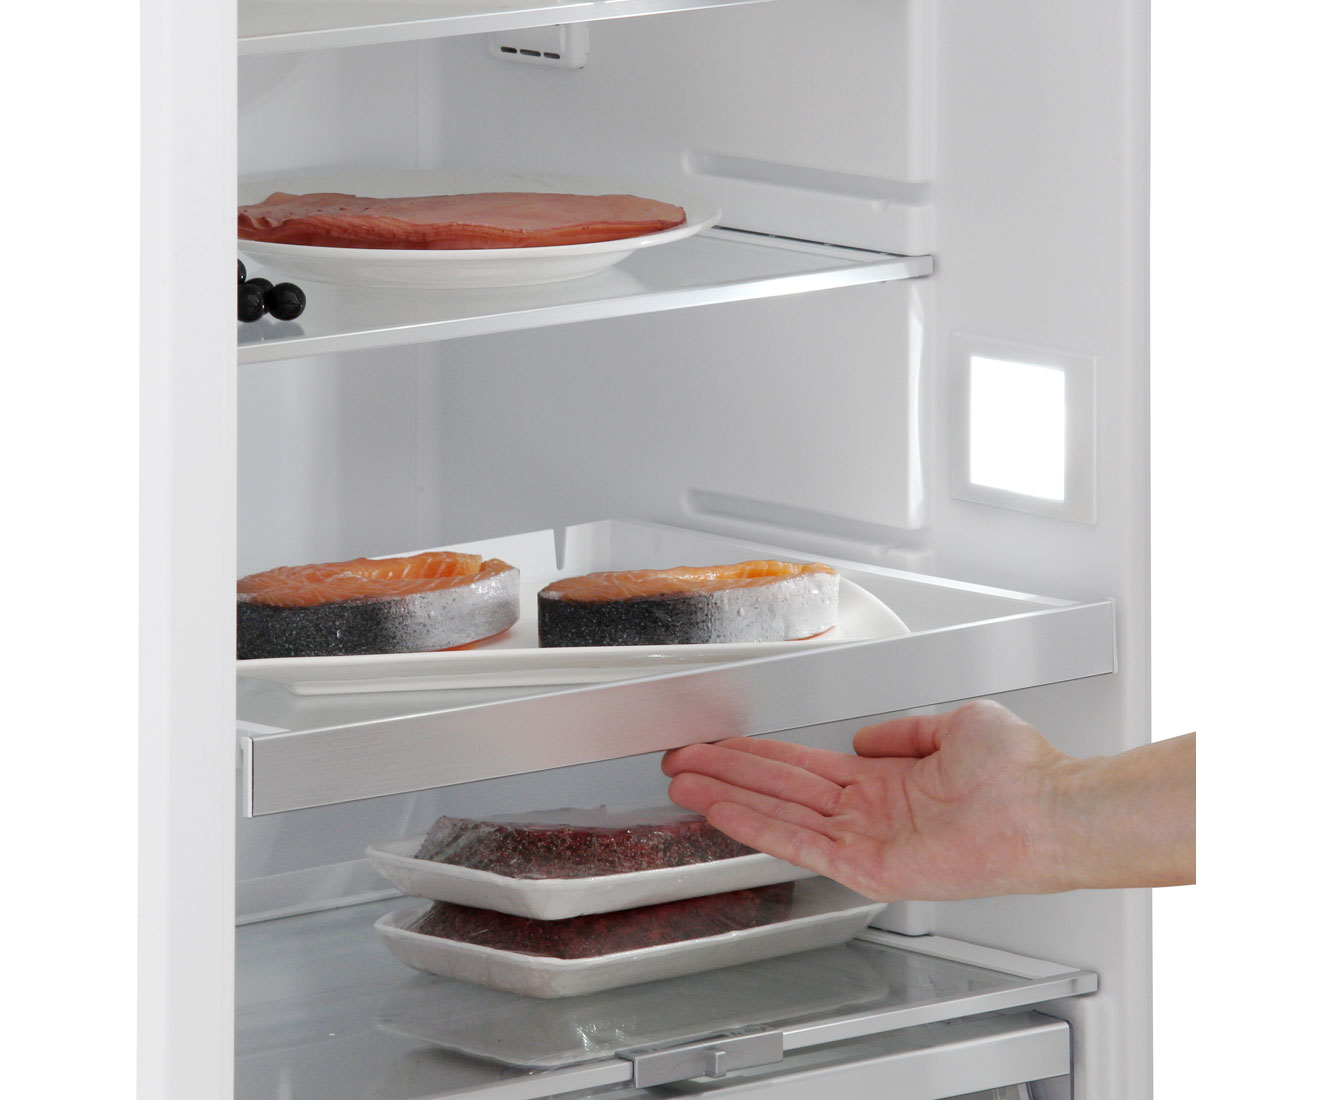 Kühlschrank Neff Zubehör : Neff k a ki d einbau kühlschrank er nische festtür